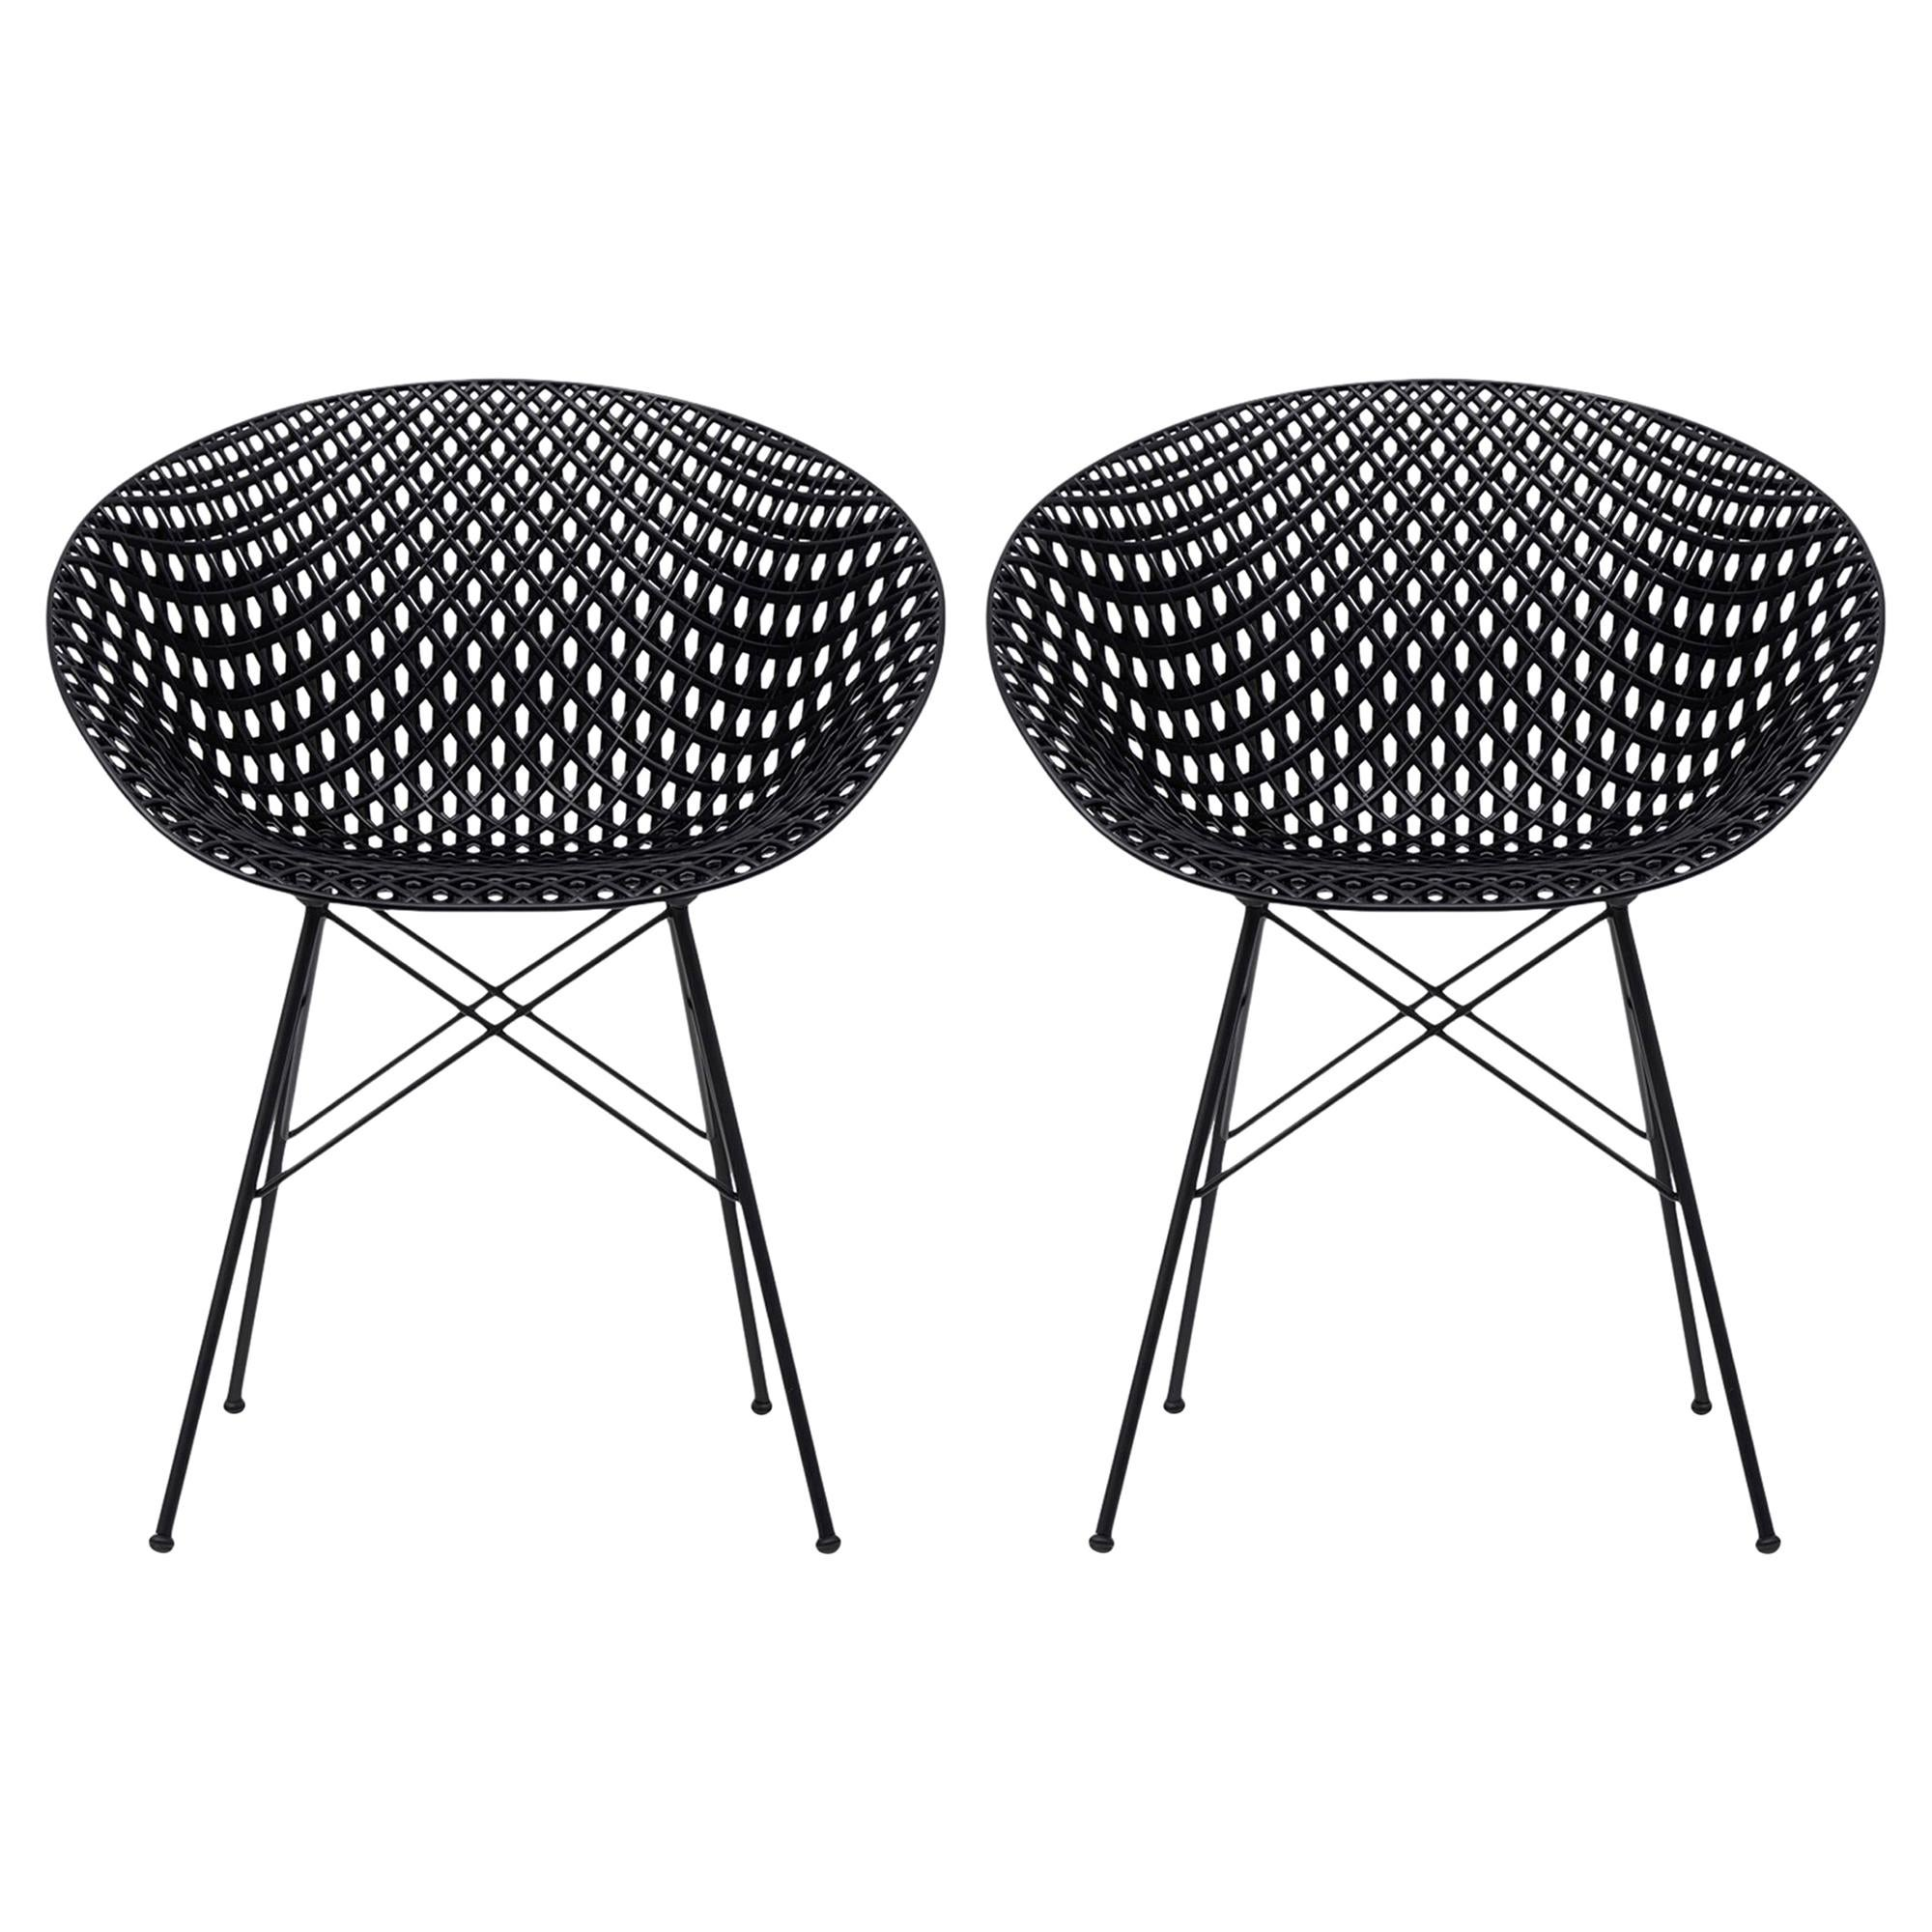 Set of 2 Kartell Smatrik Chair in Black with Black Legs by Tokujin Yoshioka